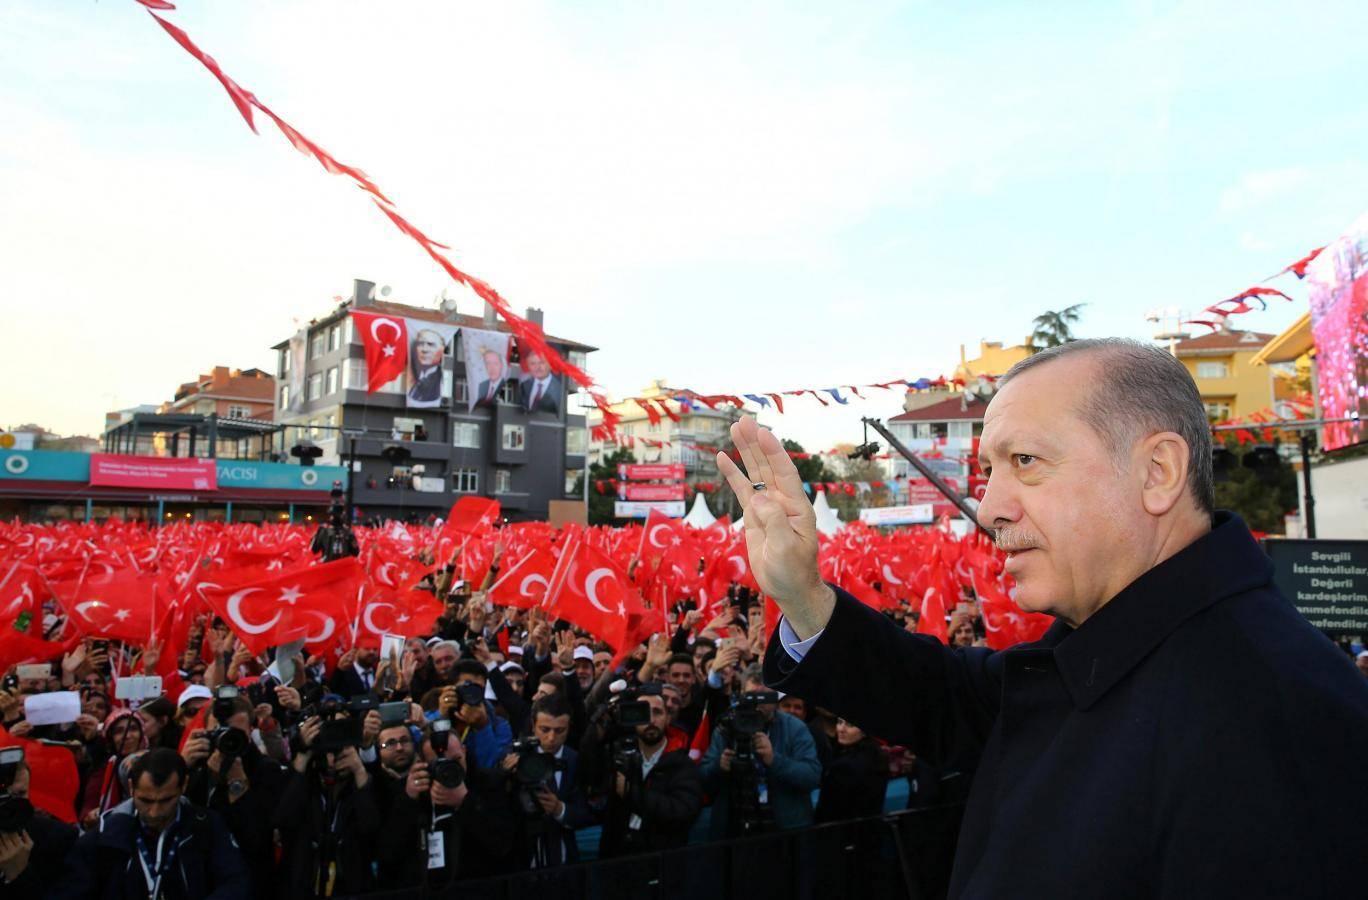 Erdogan says he will open an embassy in East Jerusalem al-Quds